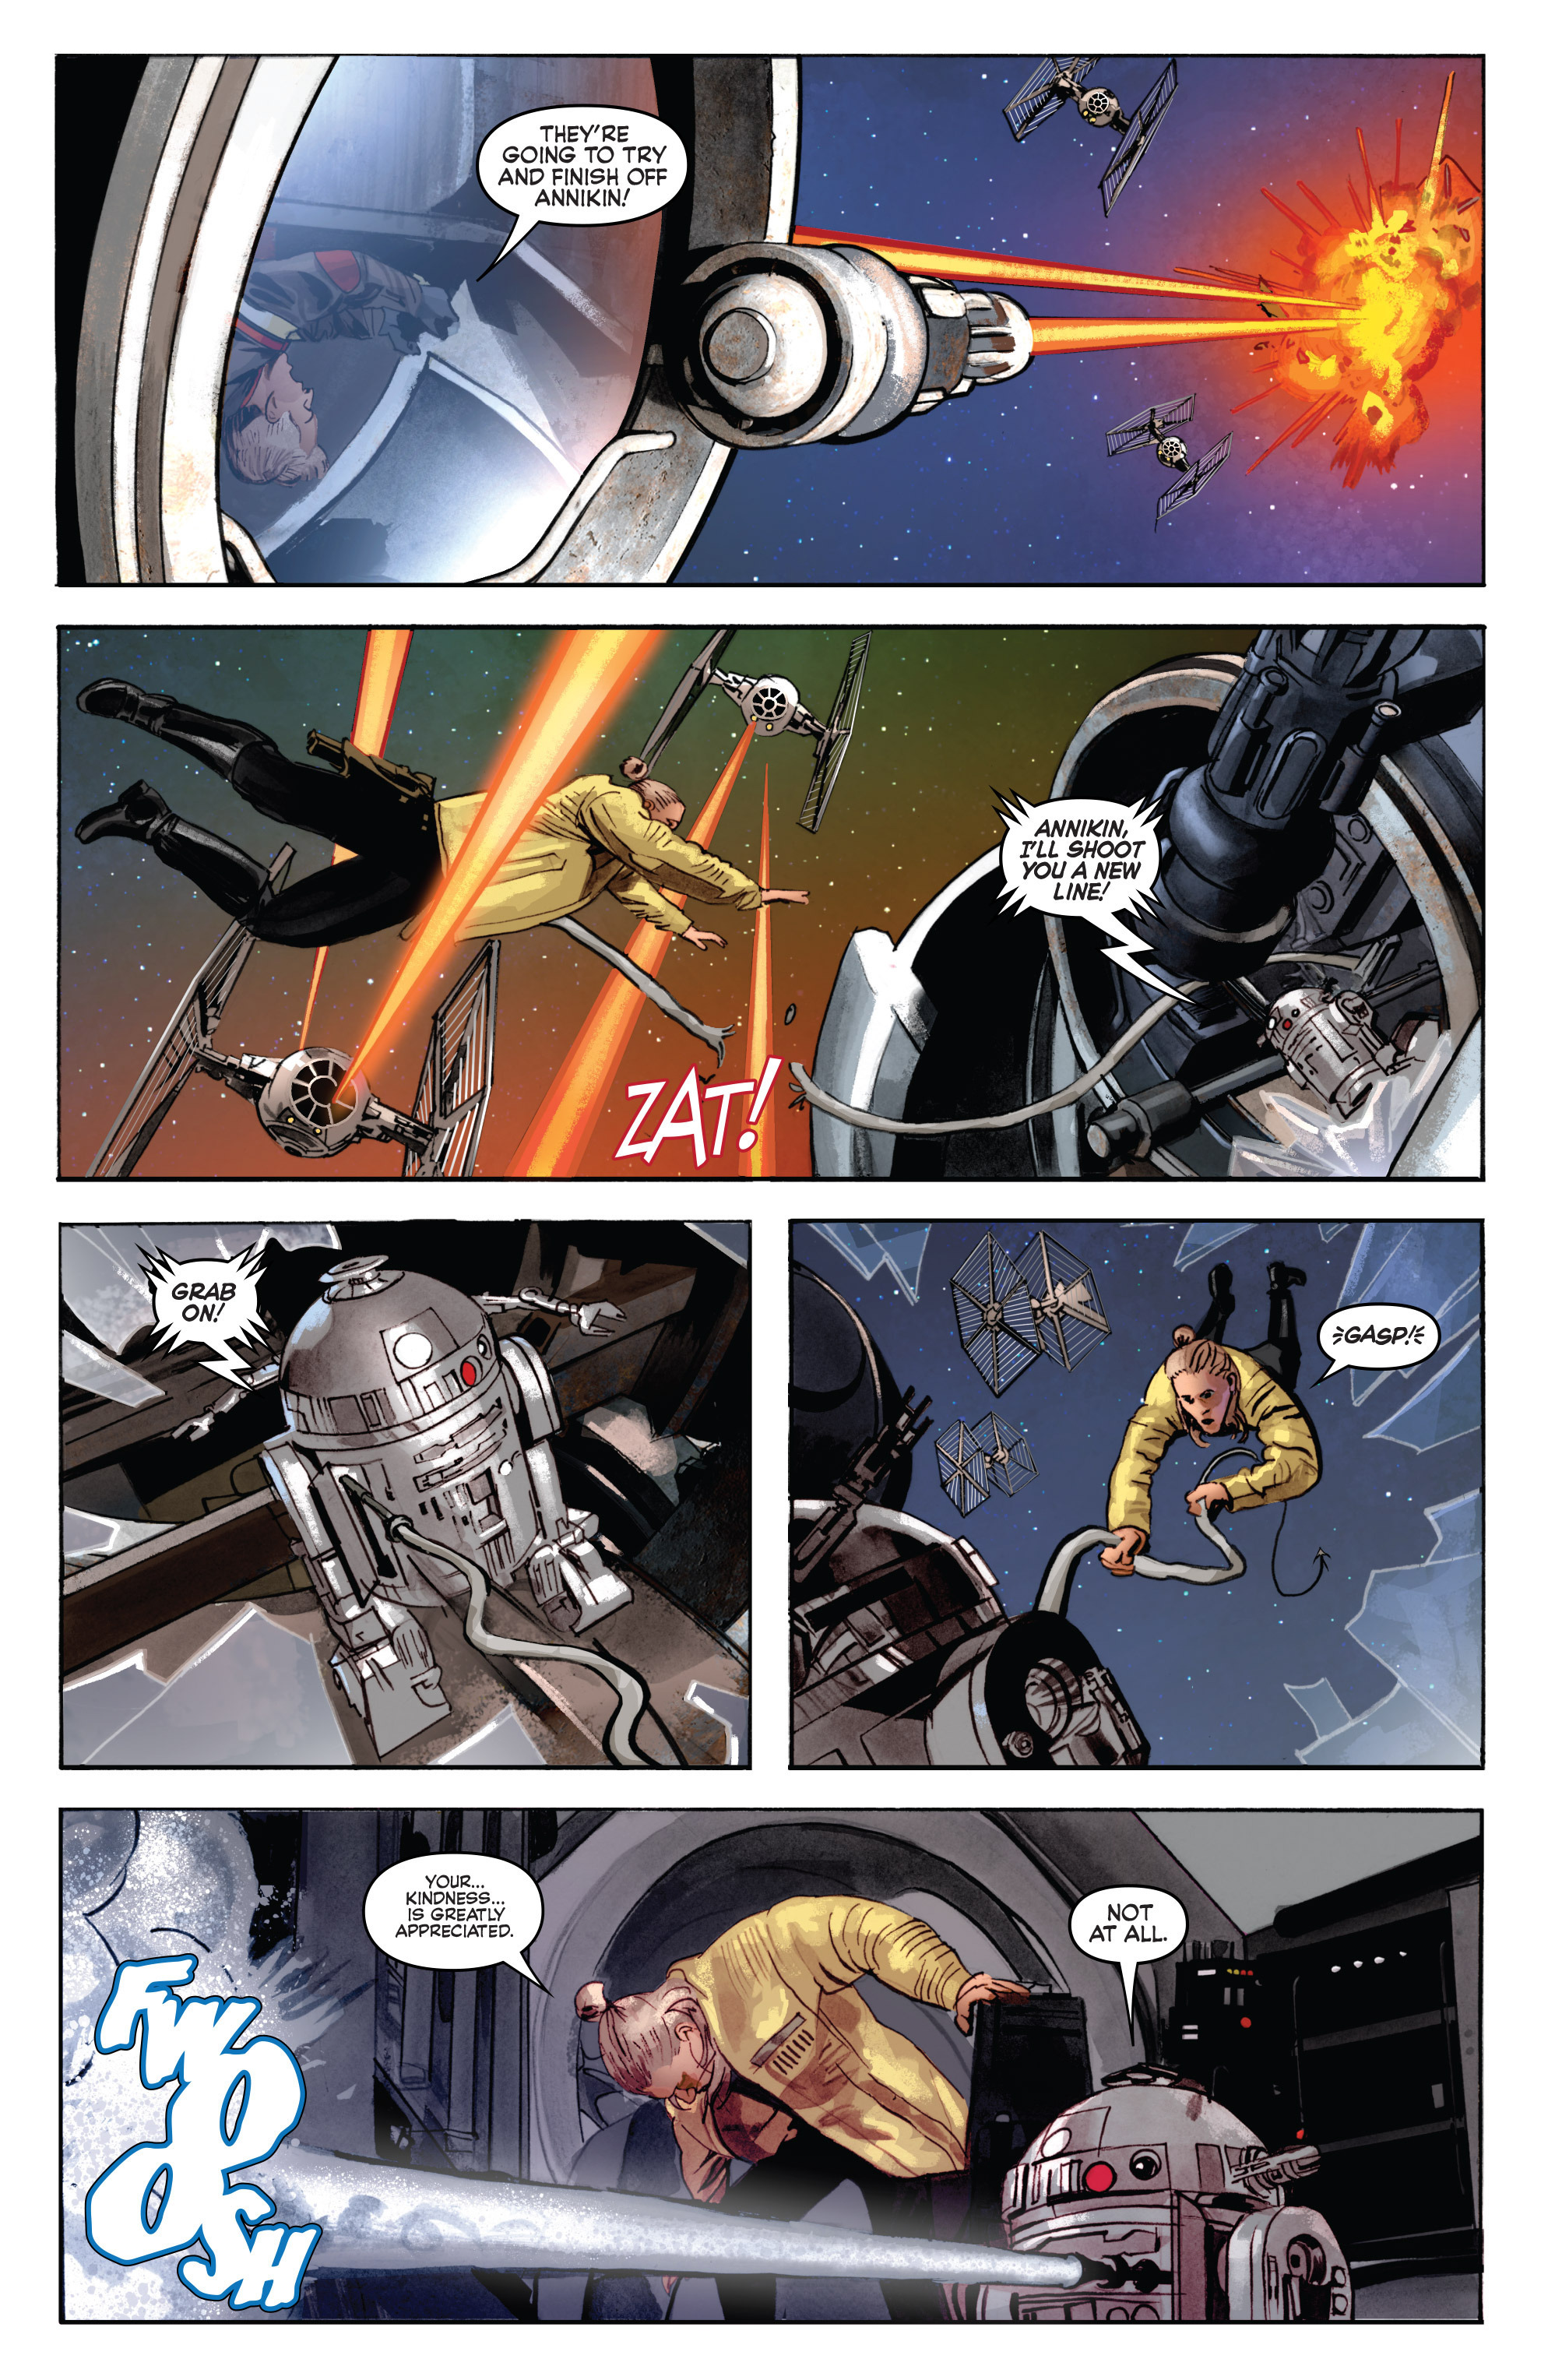 THE STAR WARS comic (2015, Marvel edition) Vol.7 6